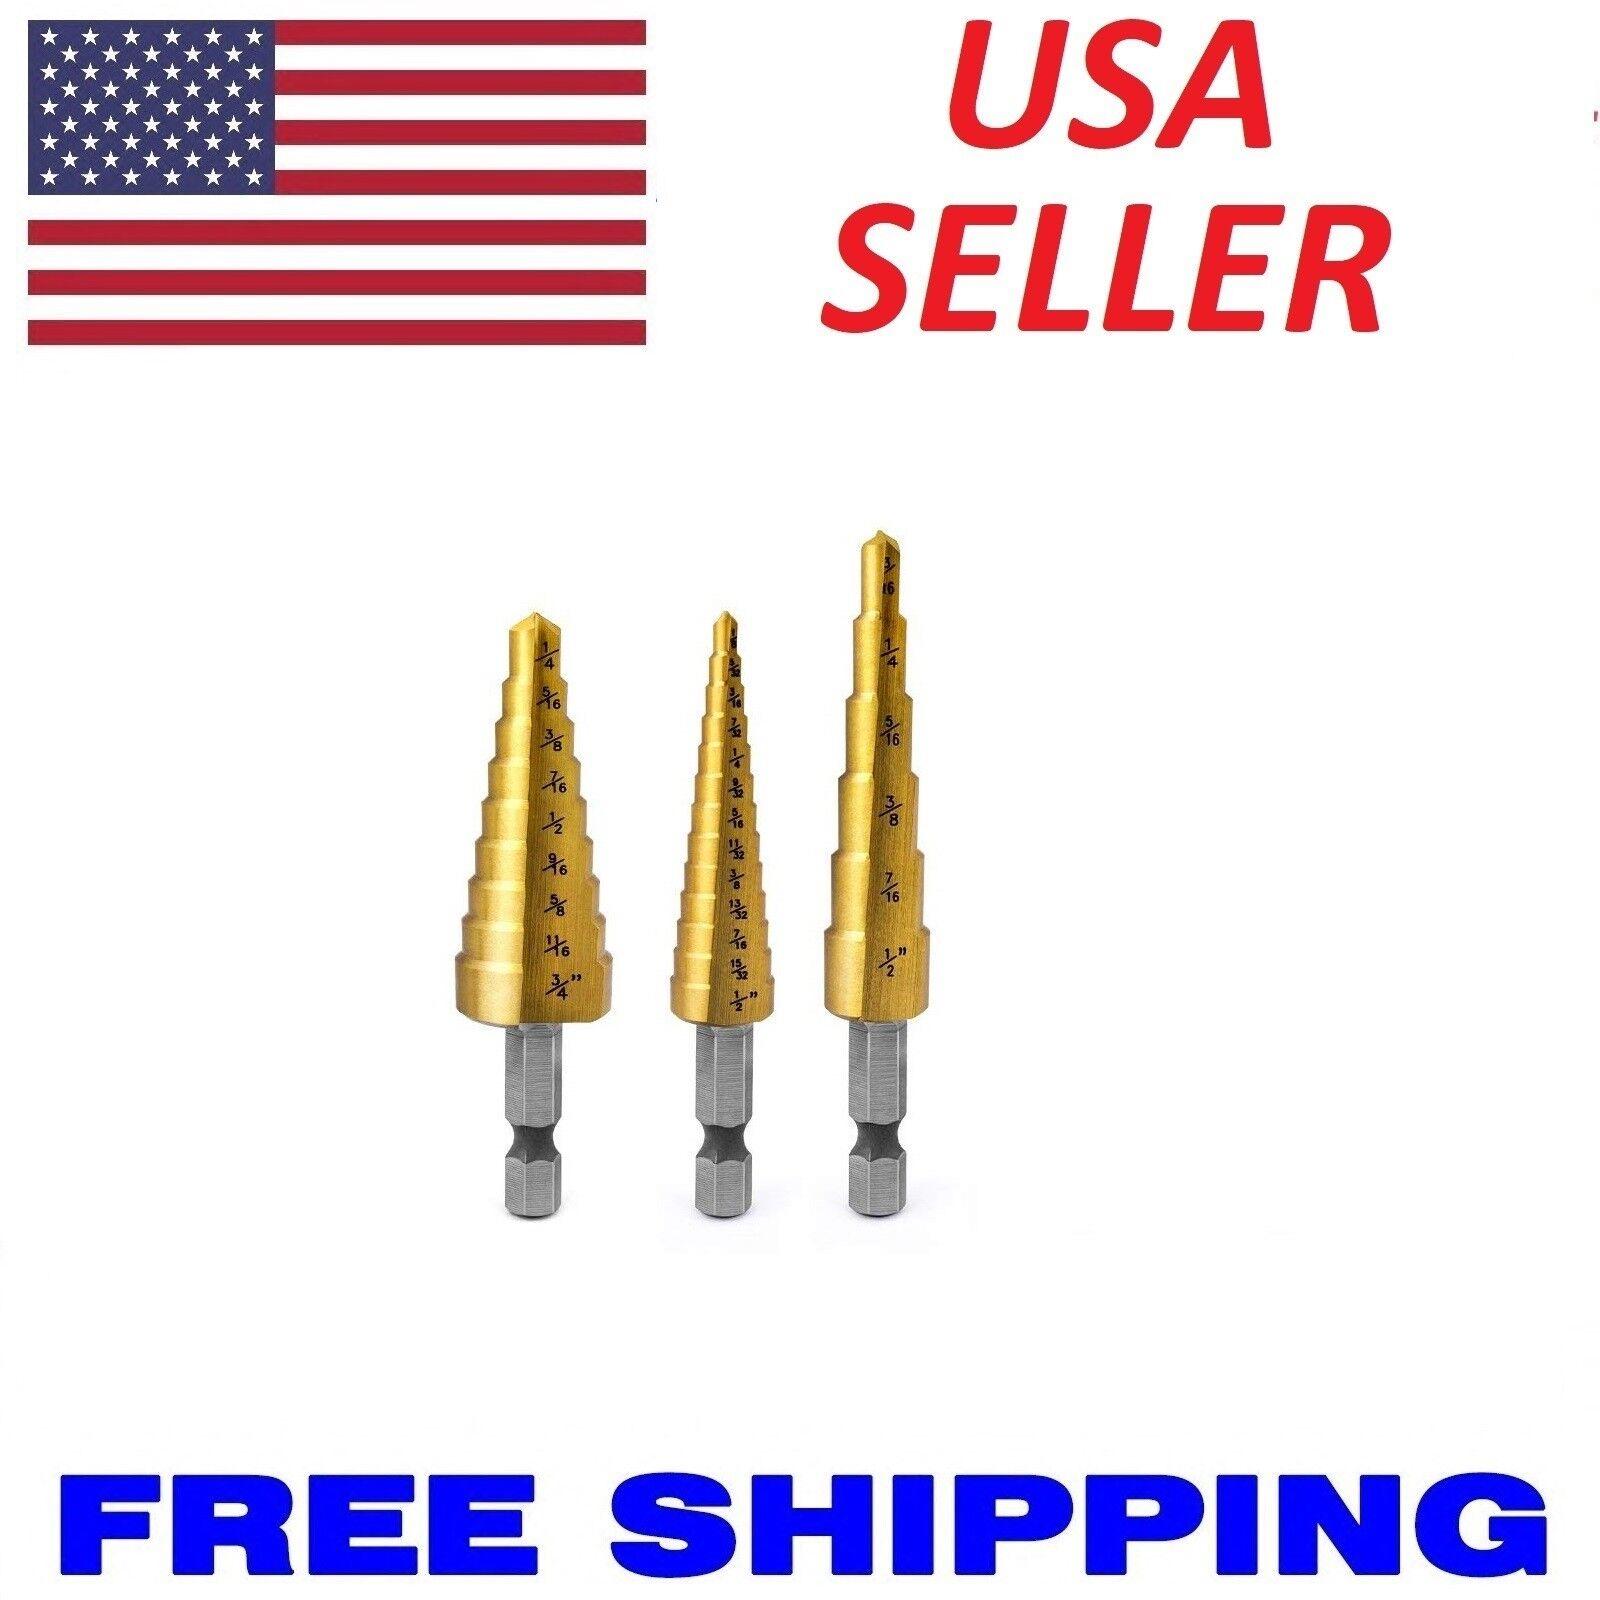 3 Step Drill Bit Set Unibit Titanium HSS M2 28 Sizes Industrial Reamer 1//8-3//16